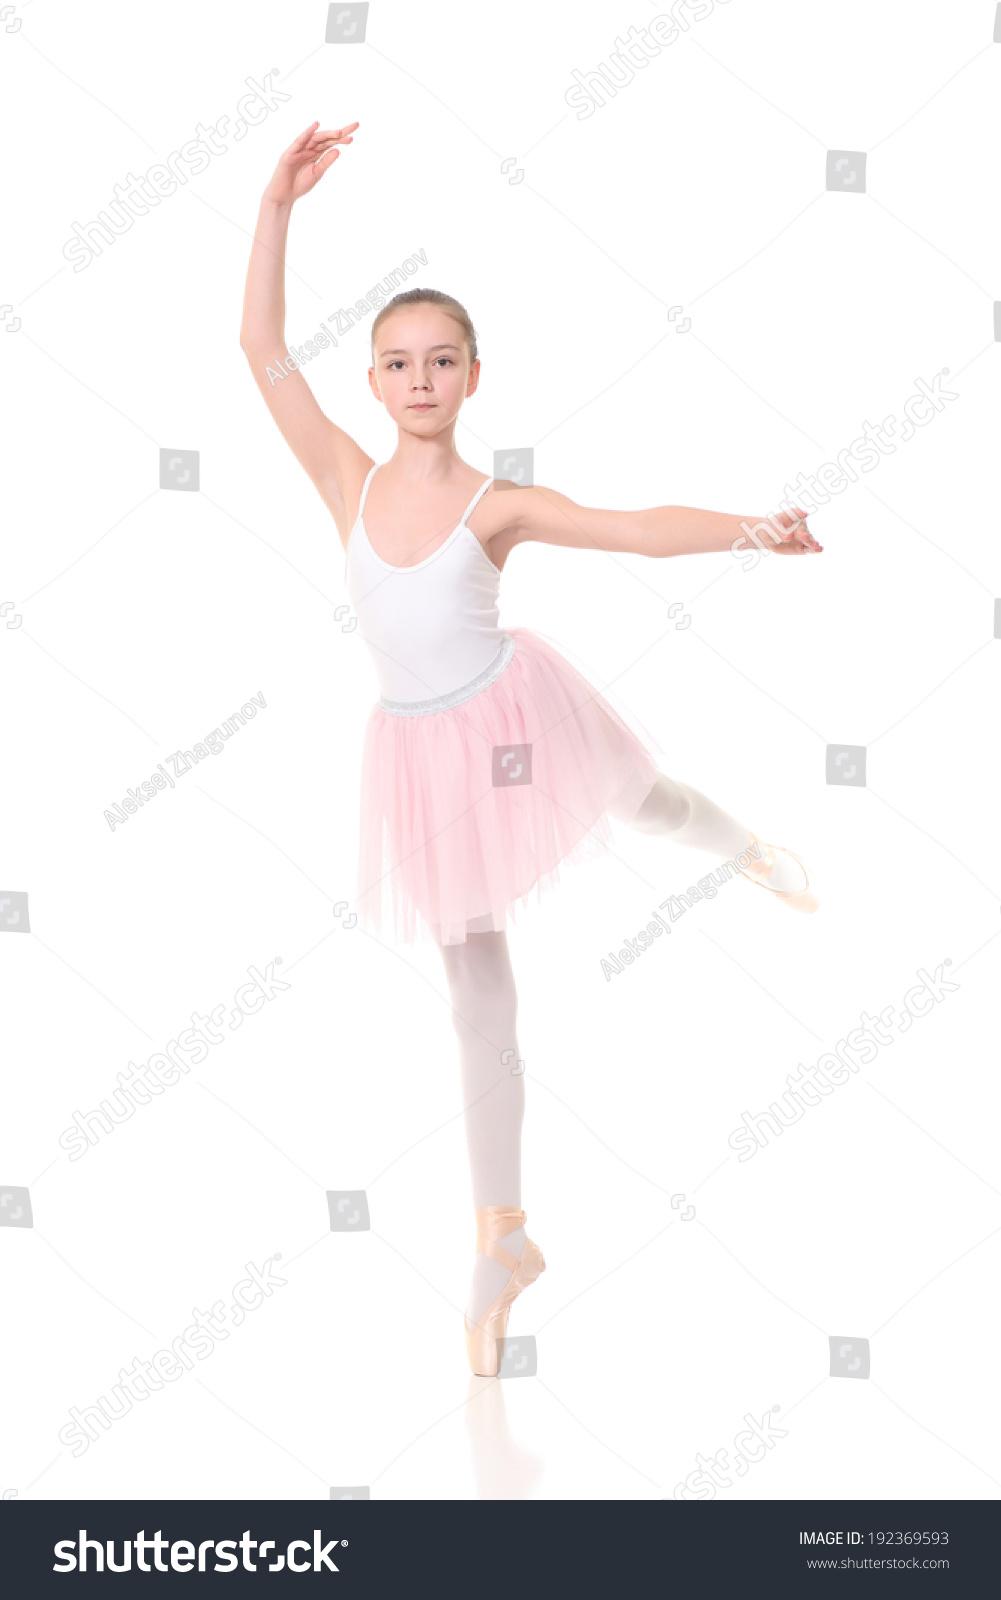 89d2cf28b56d school age girl playing dress up wearing a ballet tutu